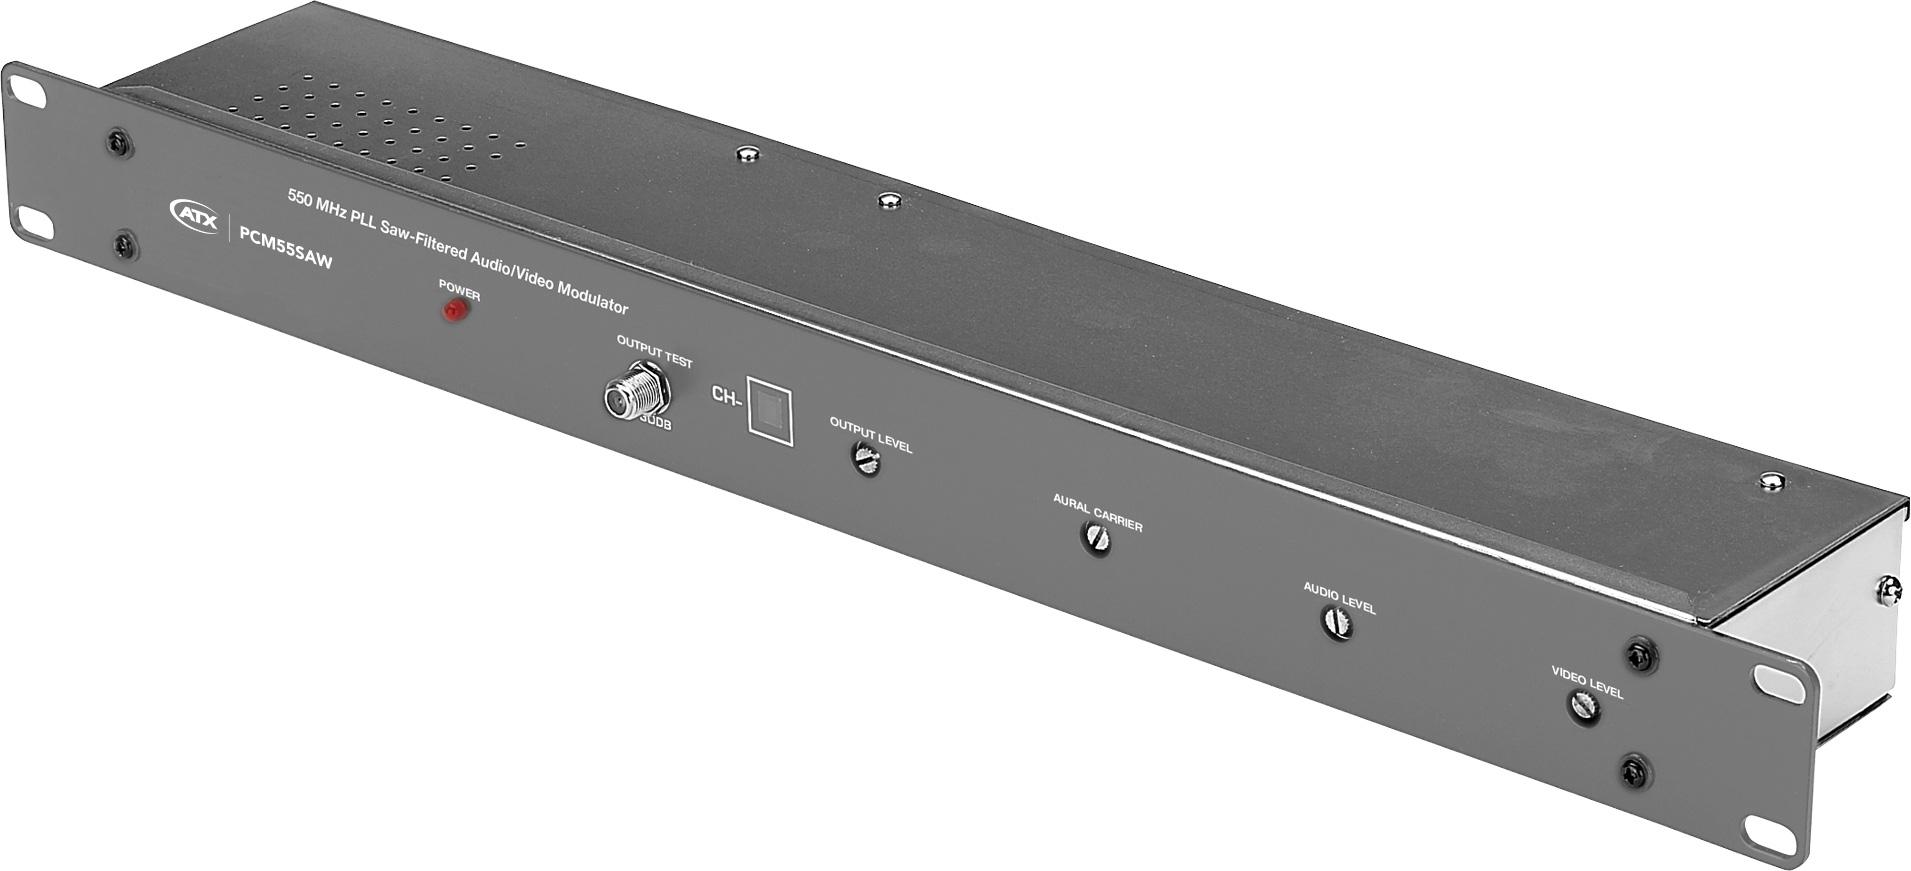 1 Channel Crystal A/V Modulator - Channel E PM-PCM55SAW-E